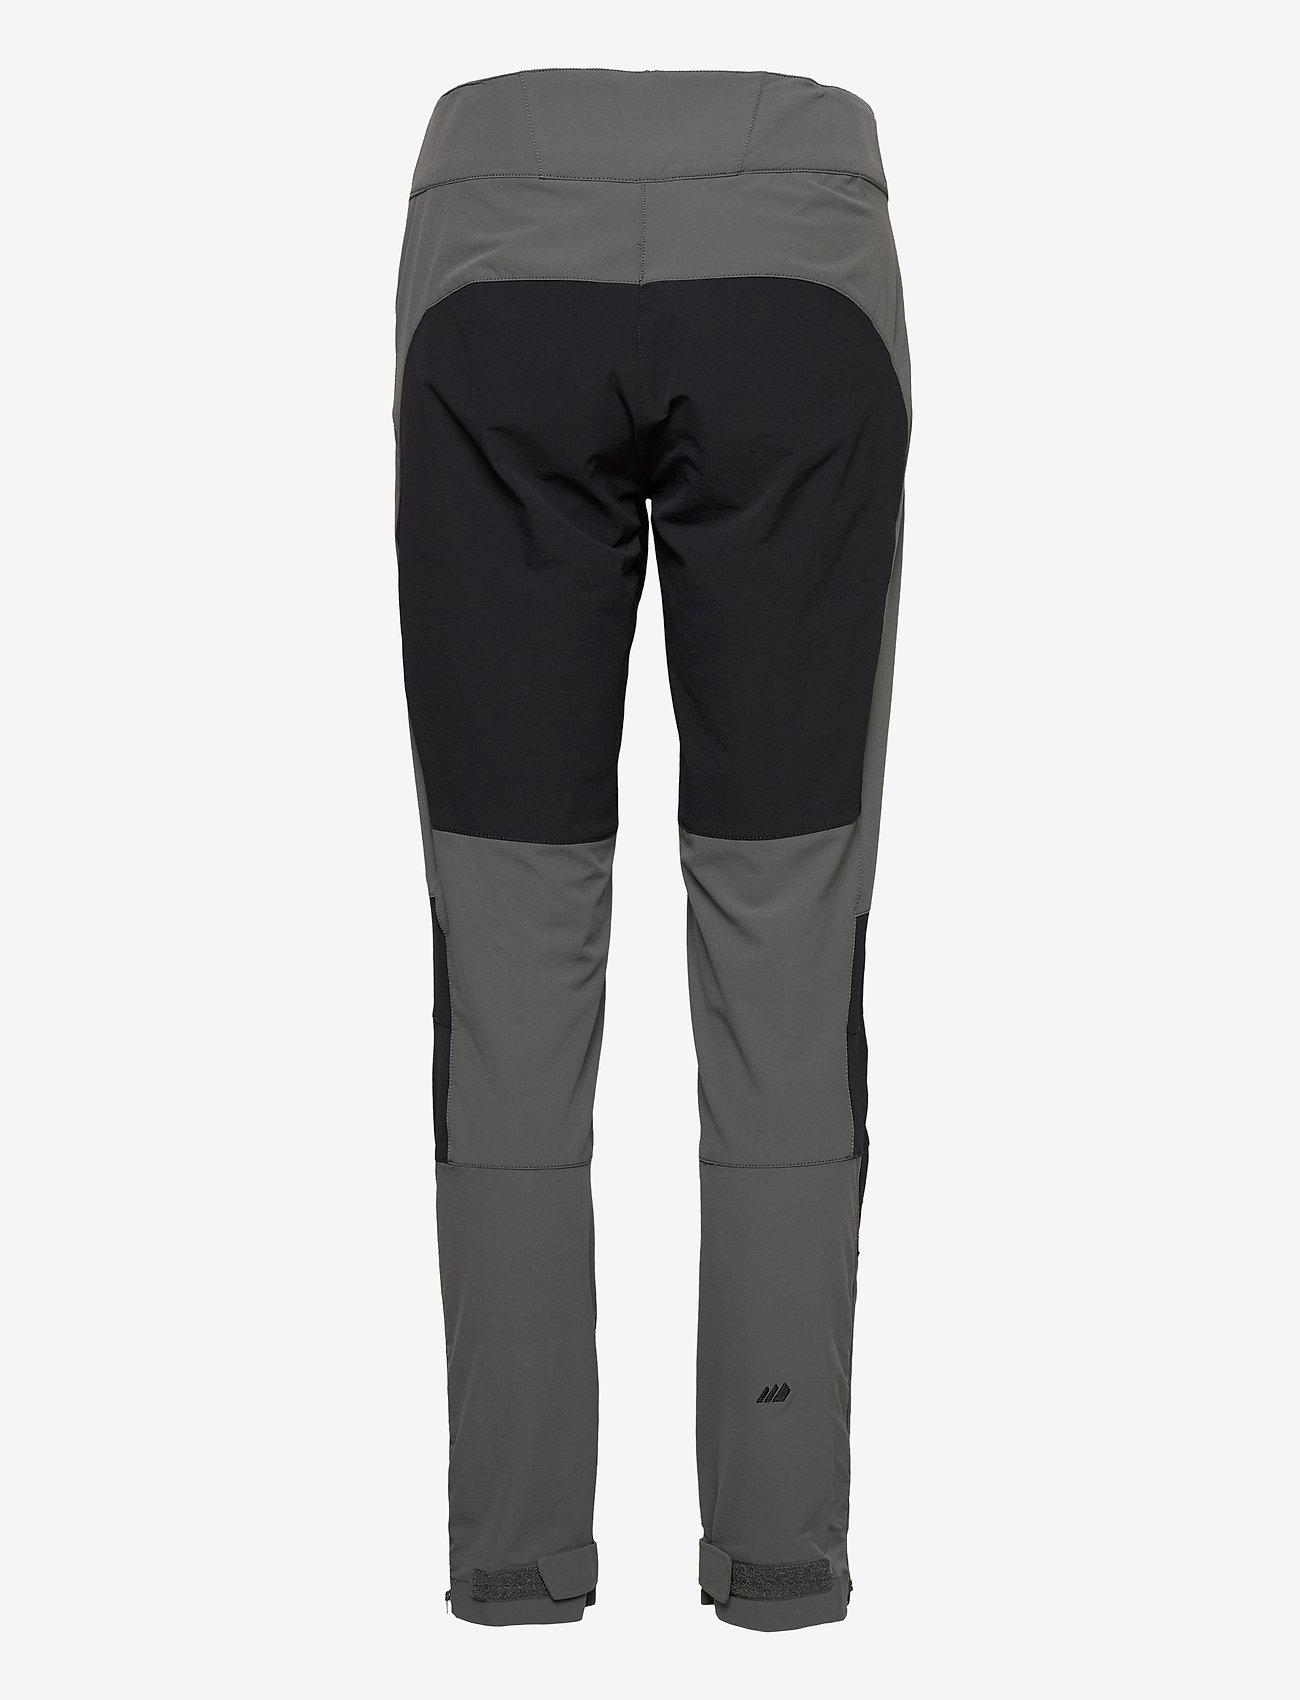 Skogstad - Ringstind hiking trouser - dark grey - 1